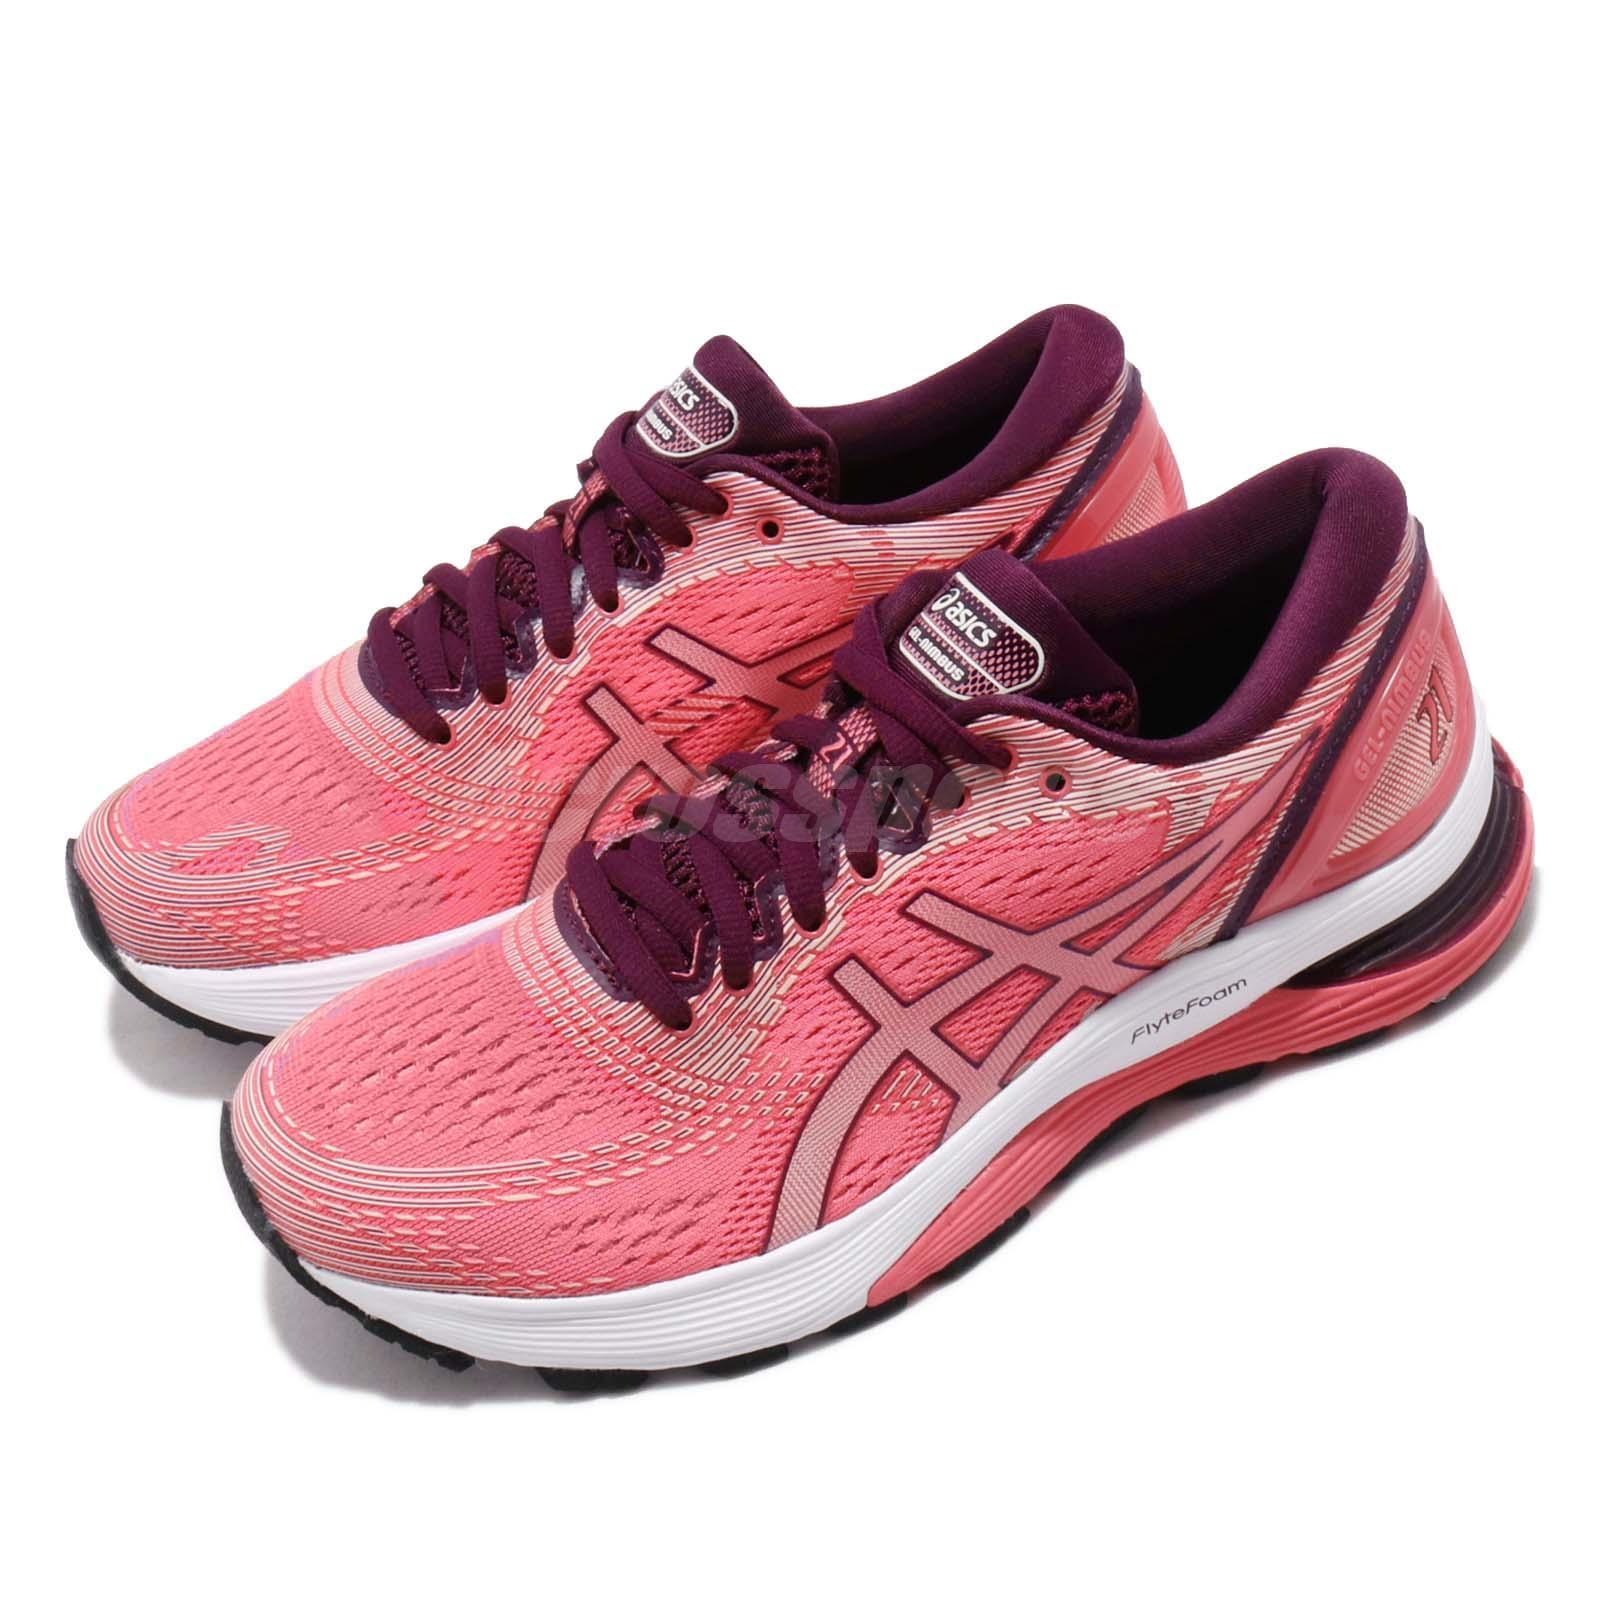 Asics Gel-Nimbus 21 Baked Pink Cameo Women Running Shoes Sneakers ...